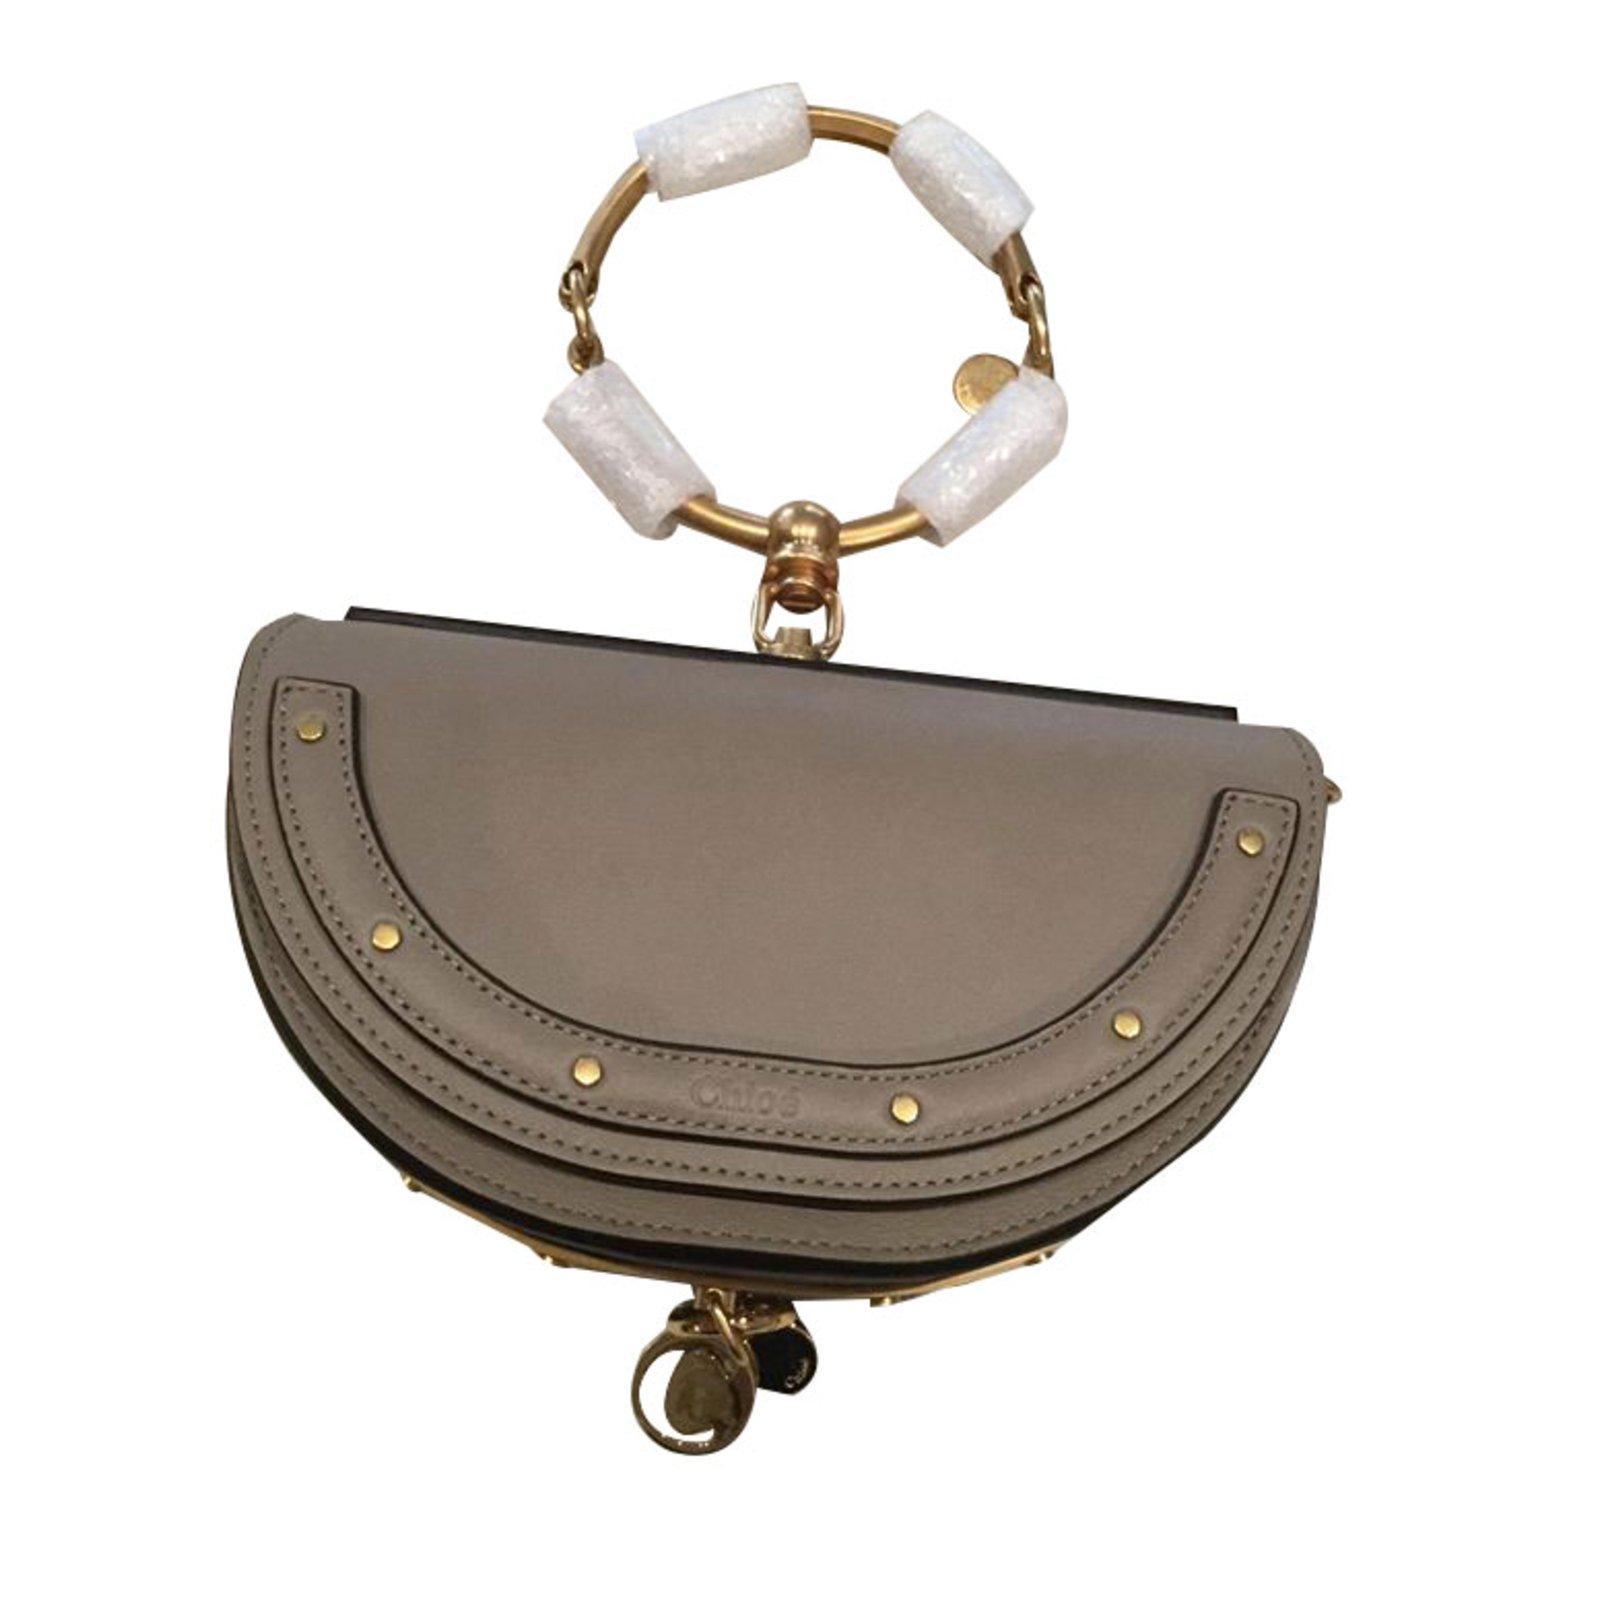 Chloé Clutch Bags Leather Grey Ref 87763 Joli